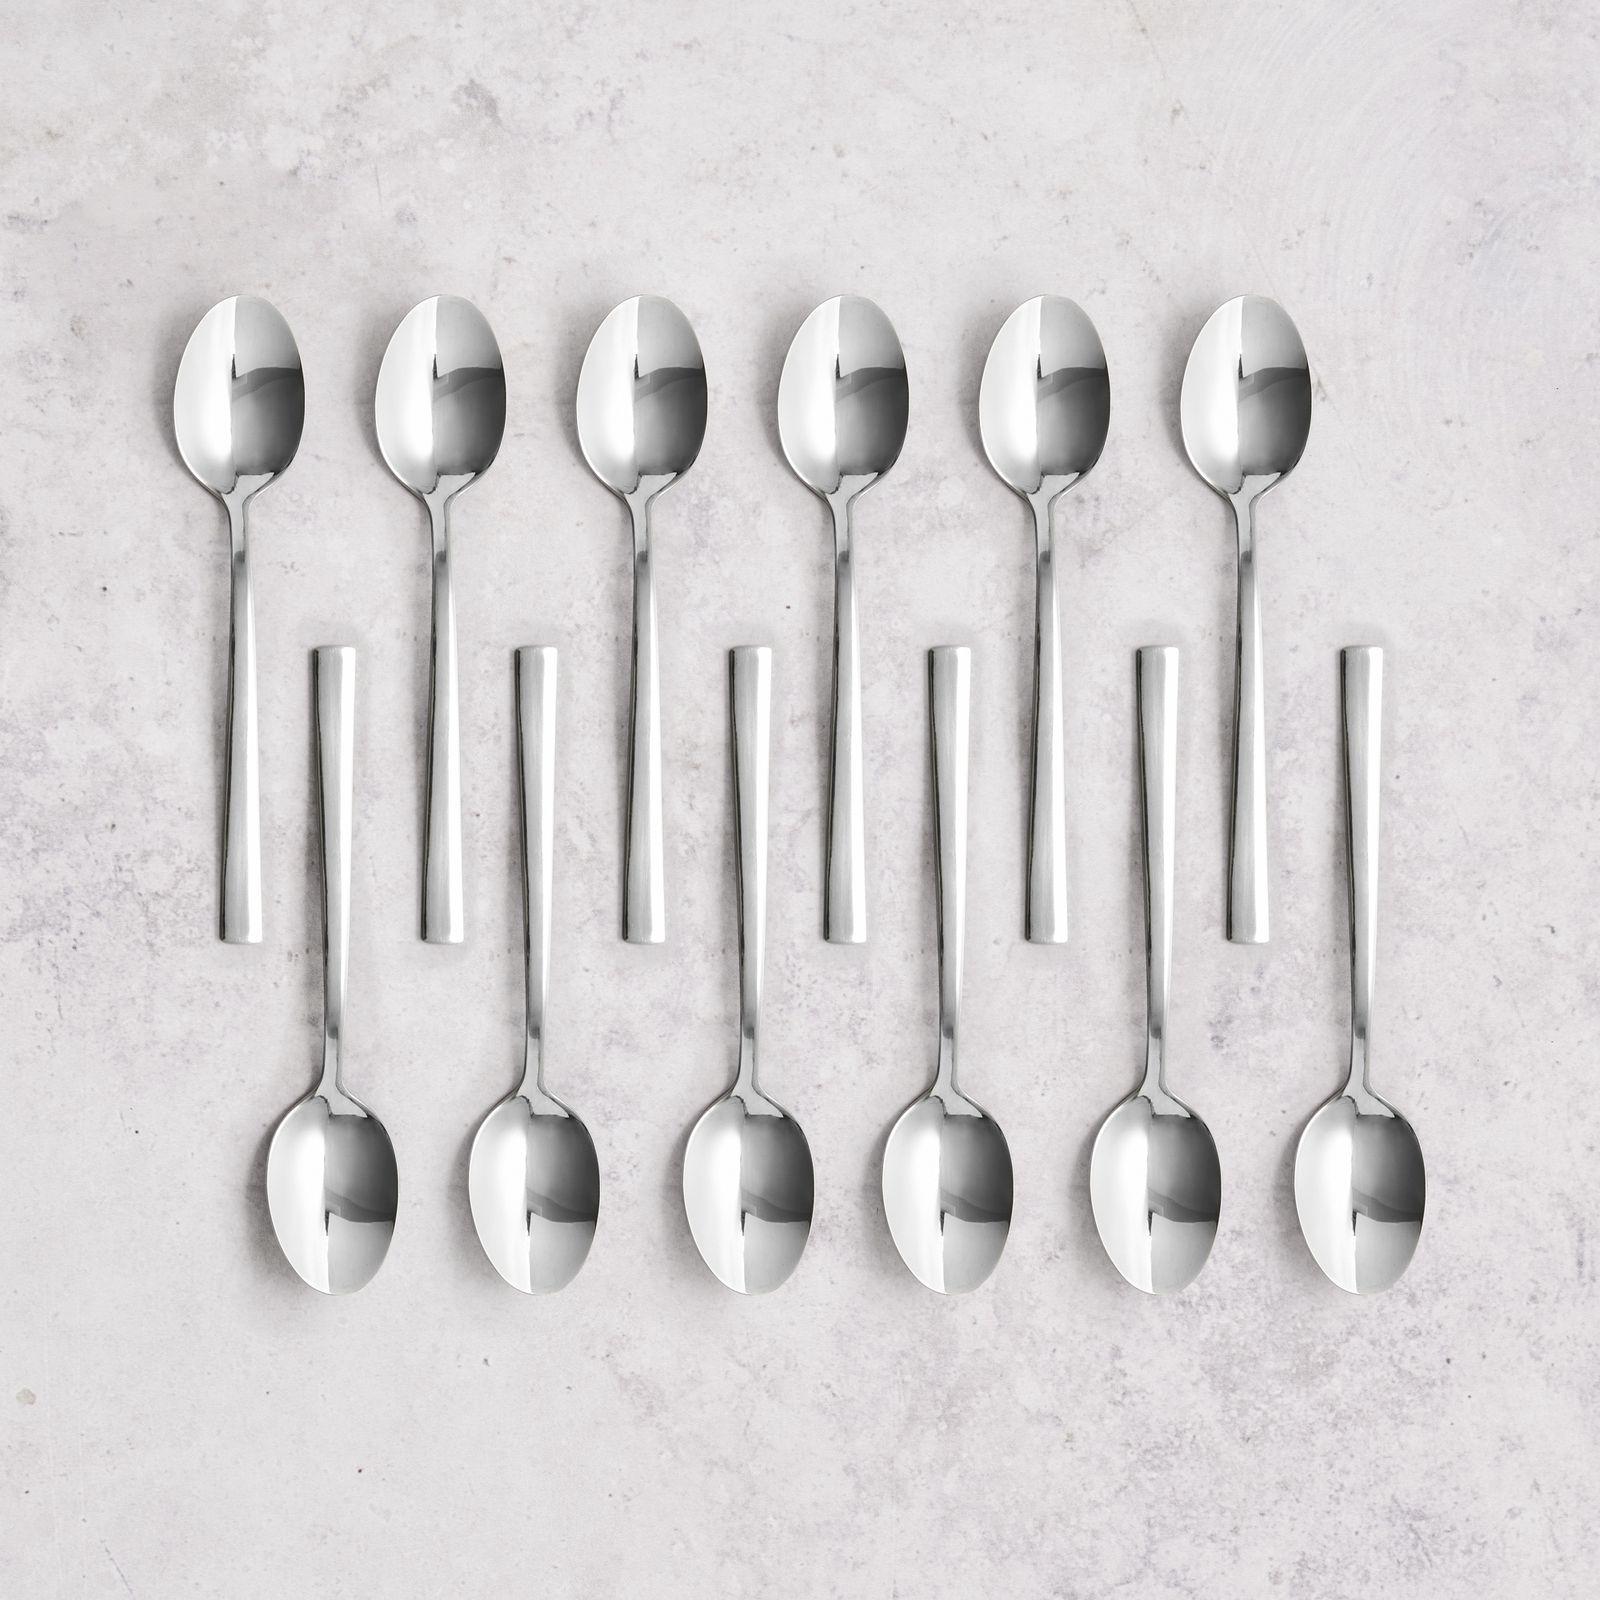 Set of 10 coffee spoons Prato AMBITION